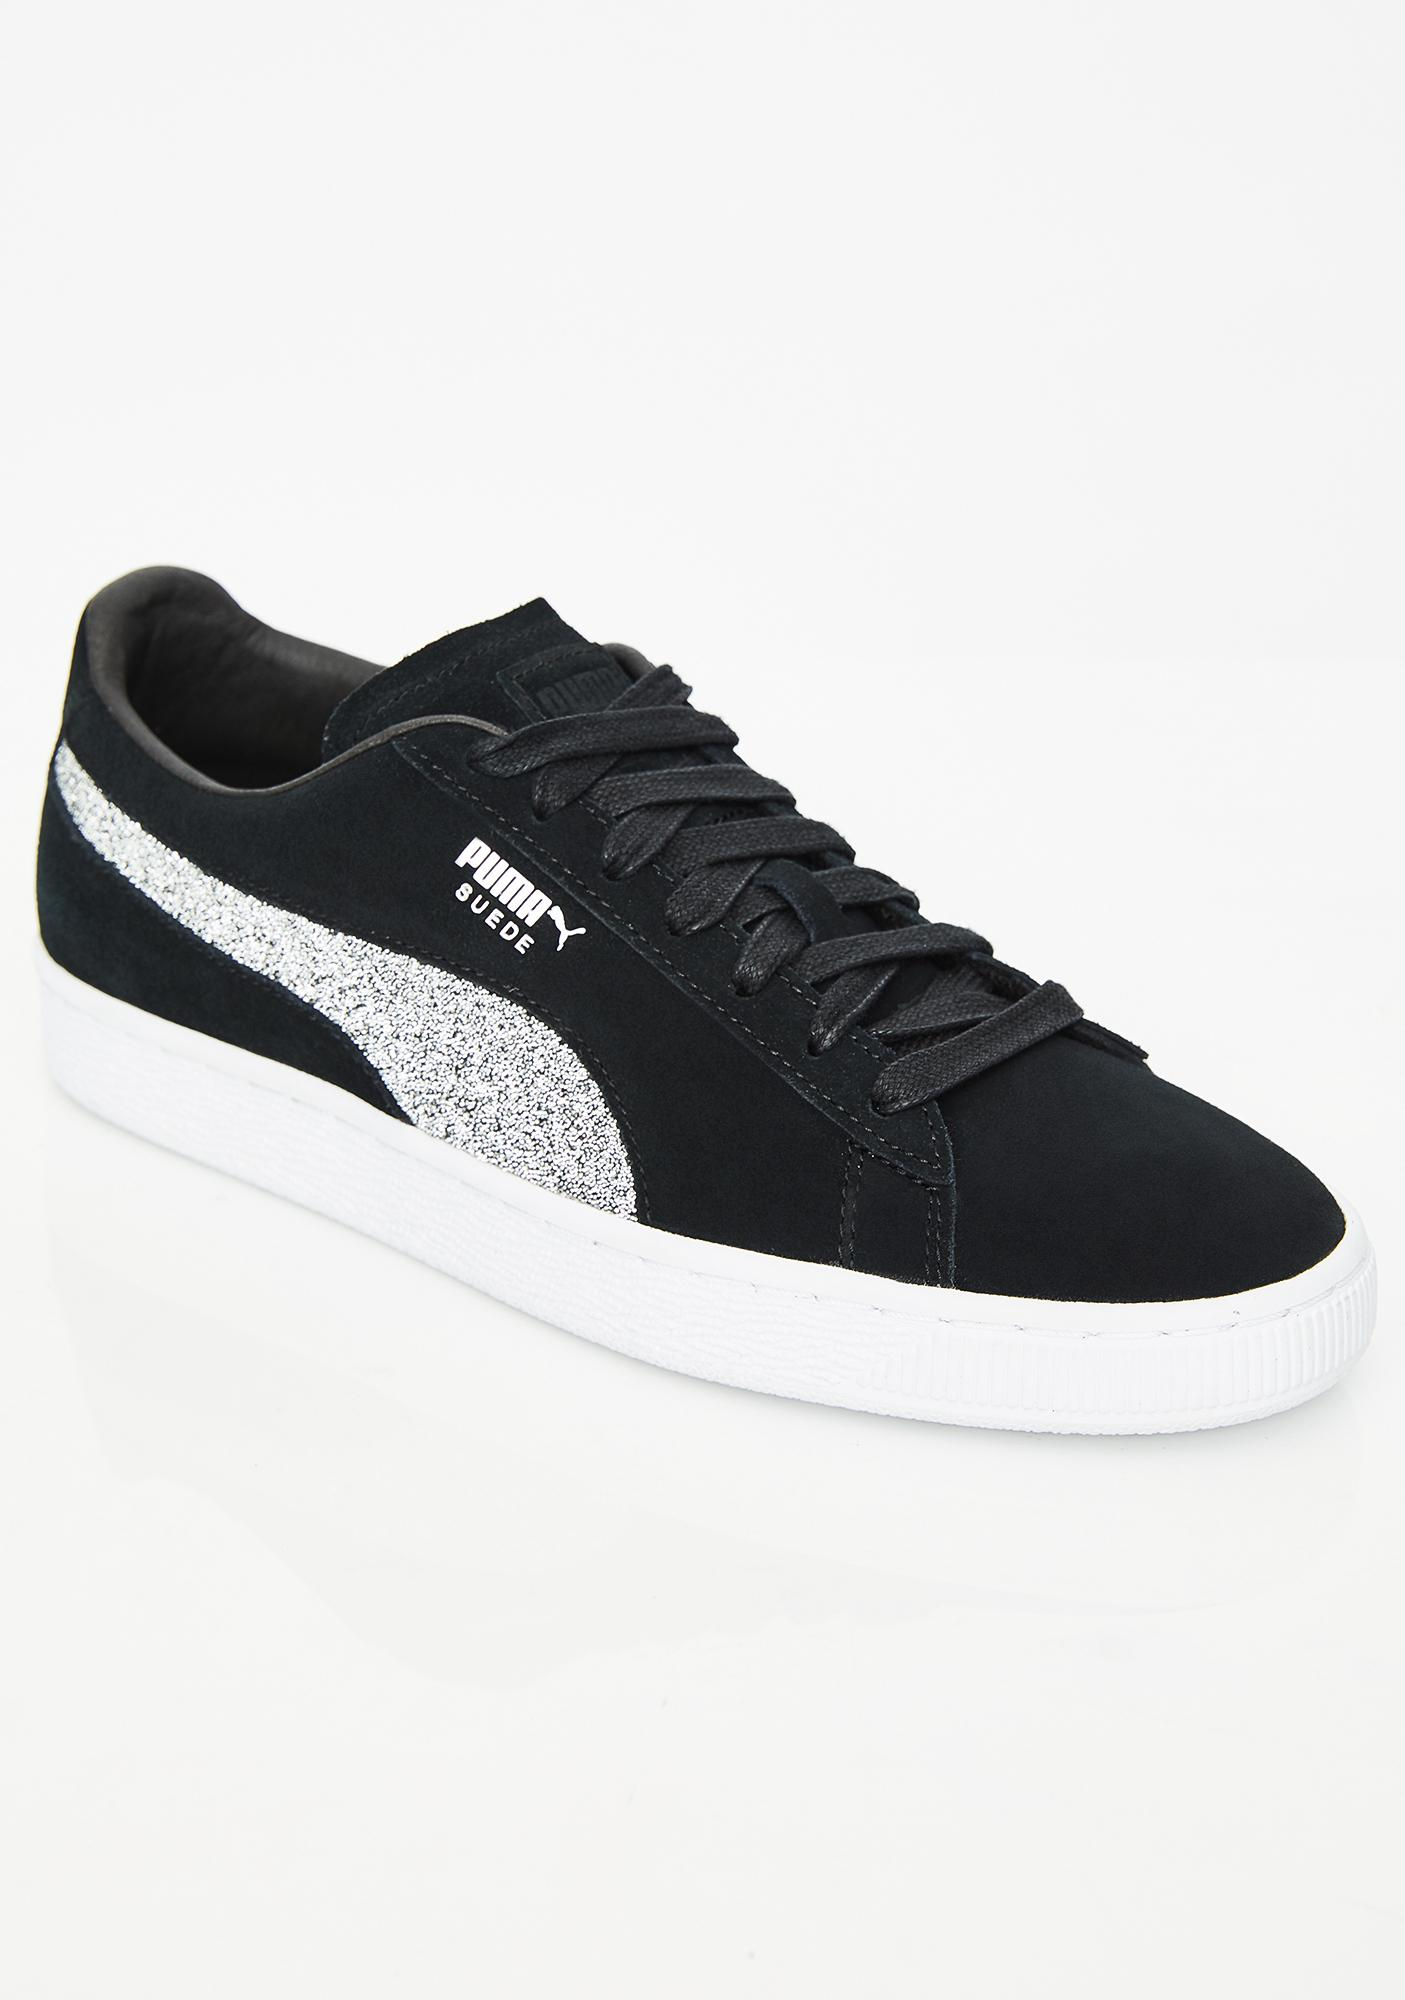 PUMA Suede Classic X Swarovski Sneakers